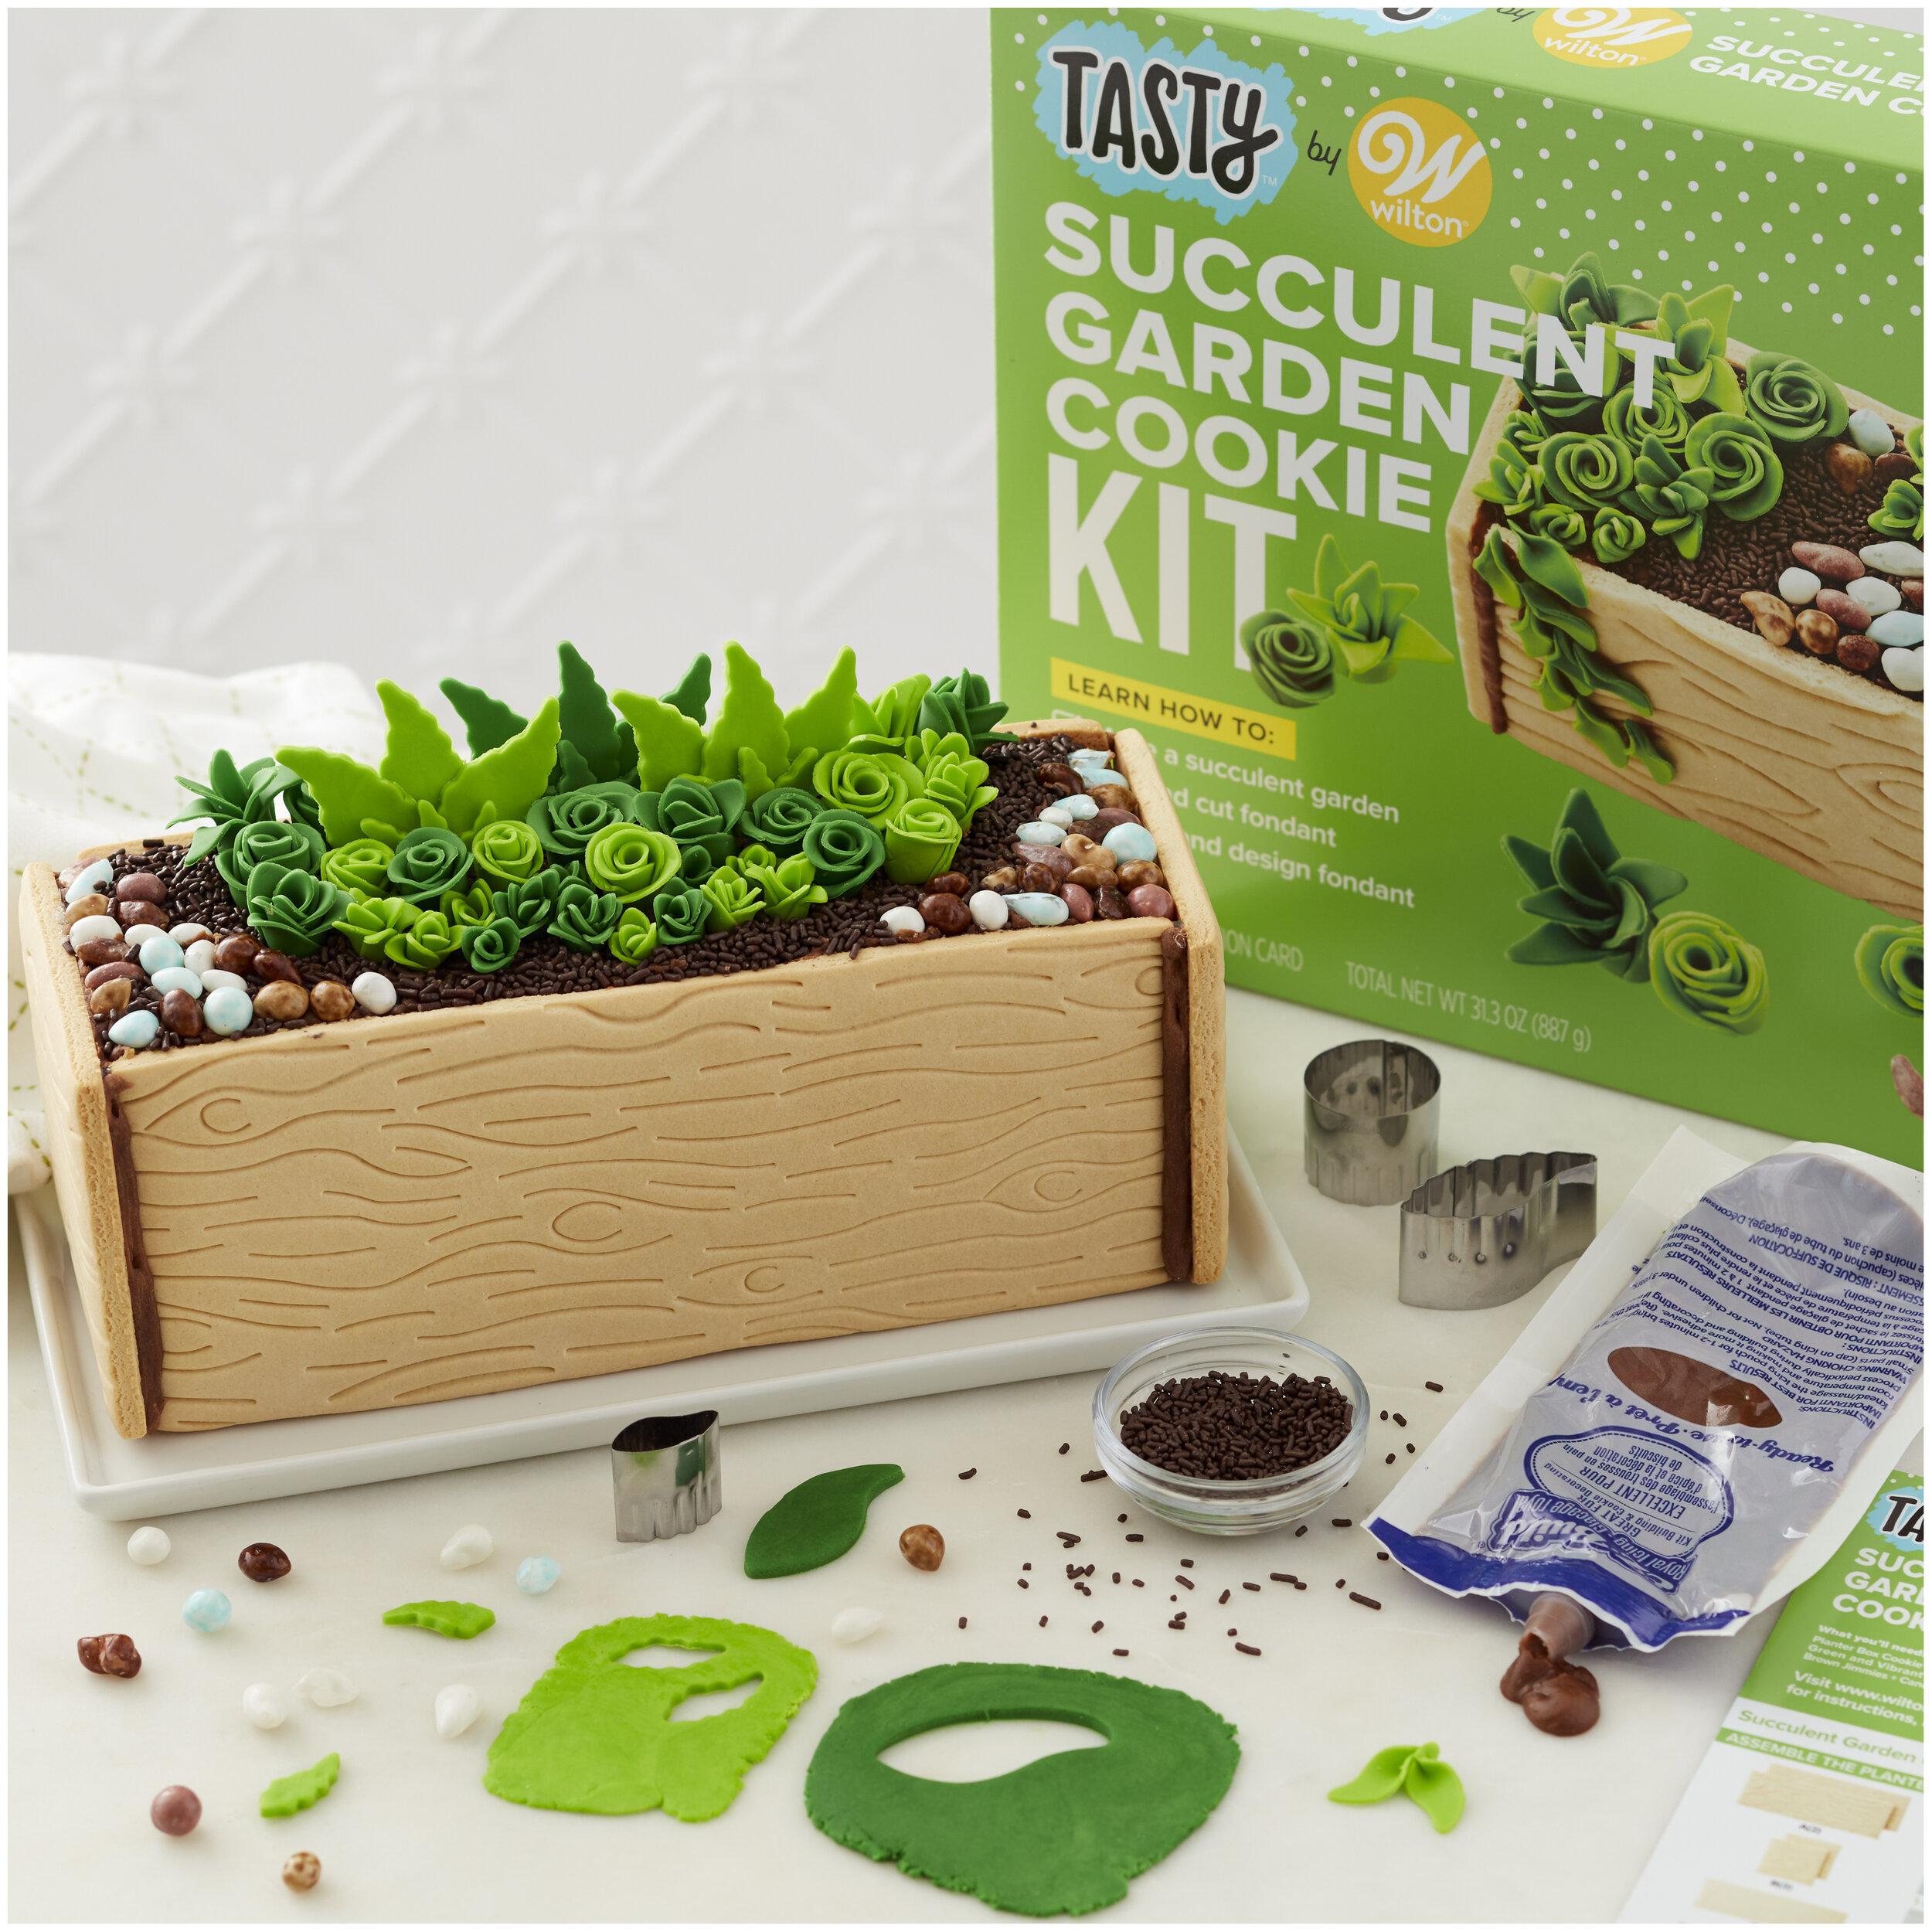 Succulent Cookie Kit - $14.98